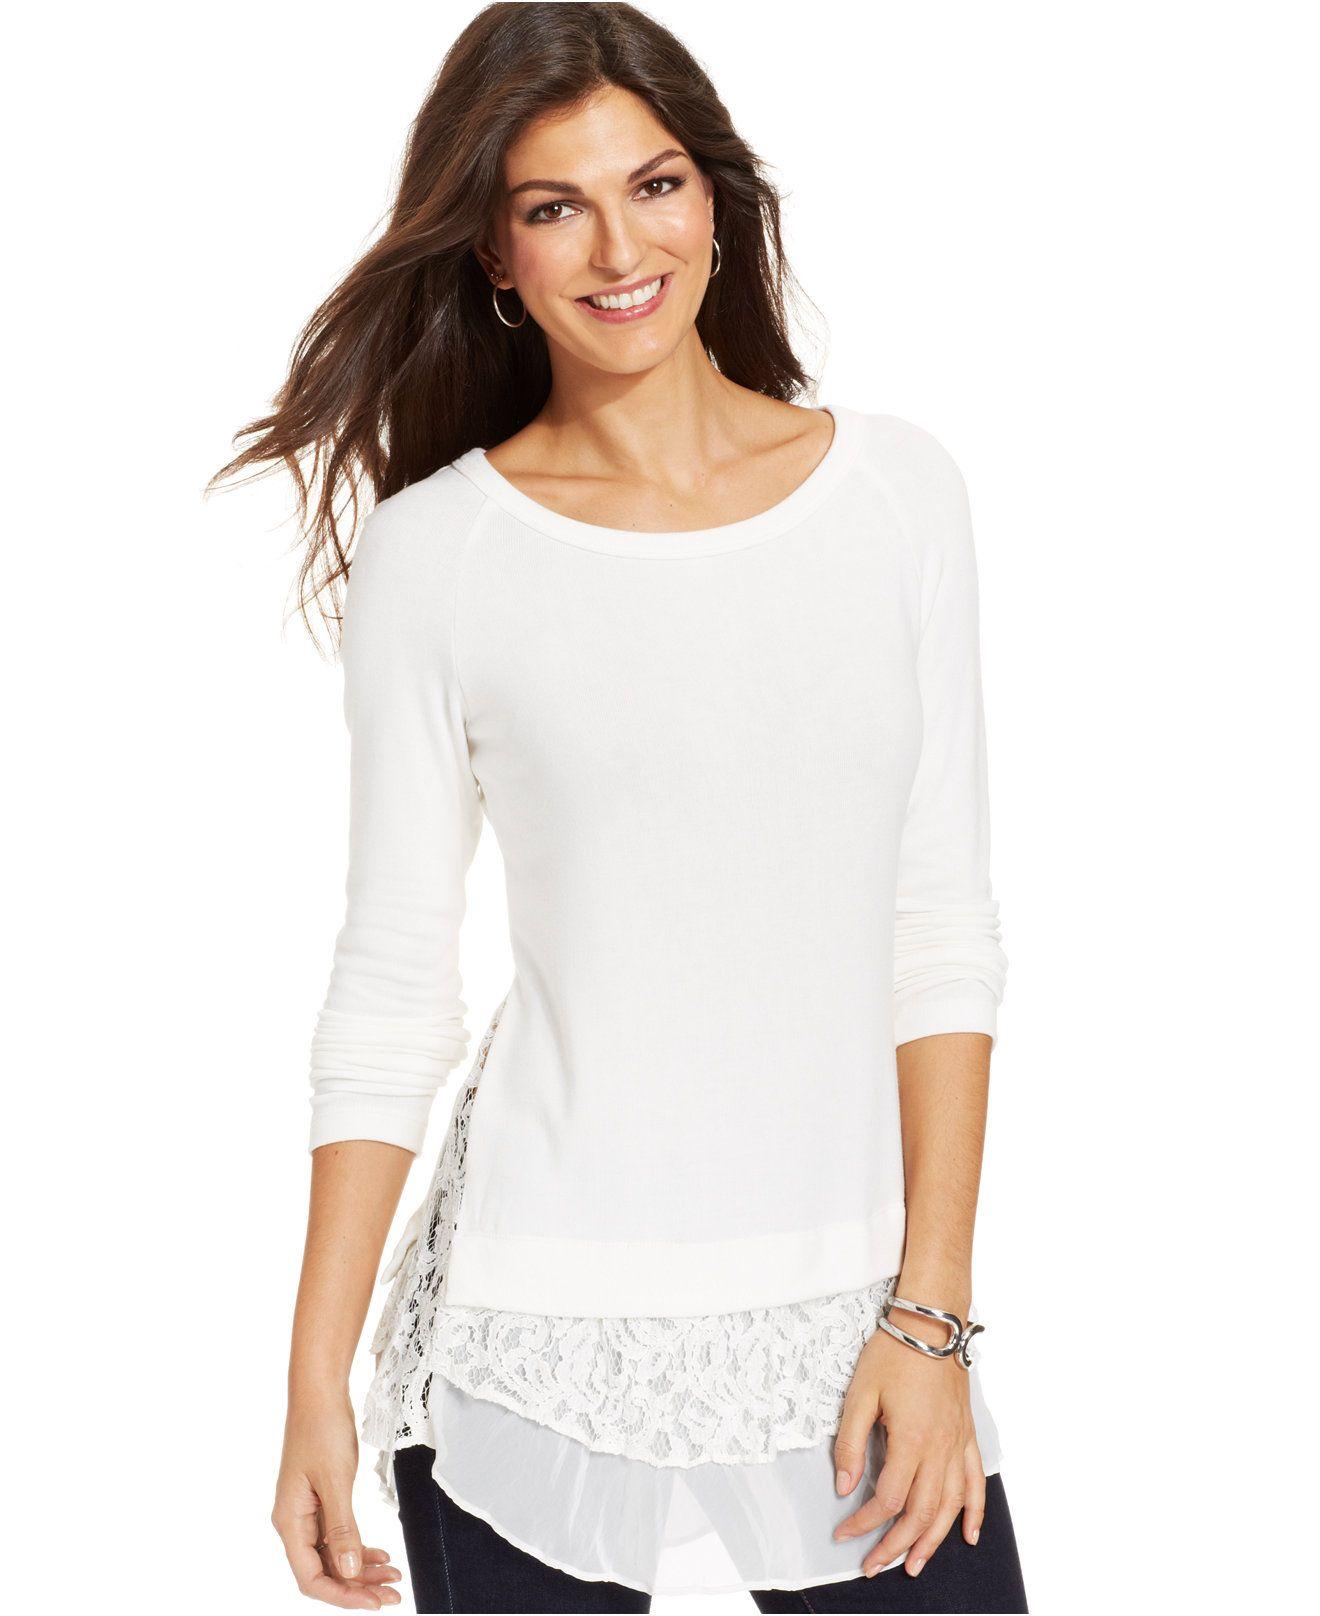 b017f9f689d Karen Kane Long Sleeve White Layered Lace Hem Sweater - Tops - Women -  Macy s  Karen Kane  Fashion  Macys